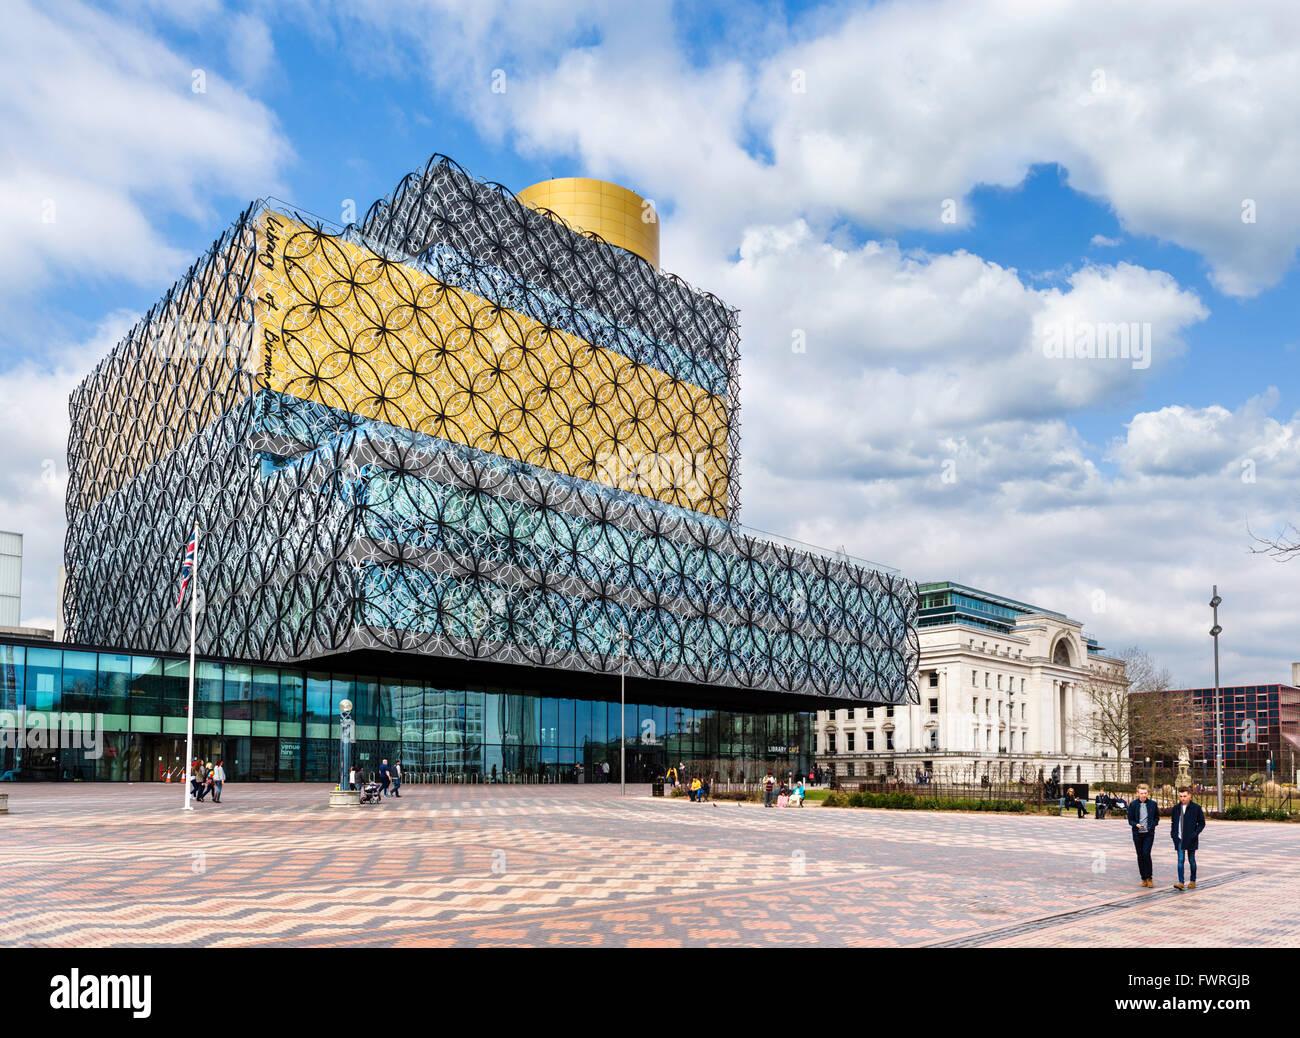 The modern Library of Birmingham, designed by Francine Houben, Centenary Square, Birmingham, West Midlands, England, - Stock Image